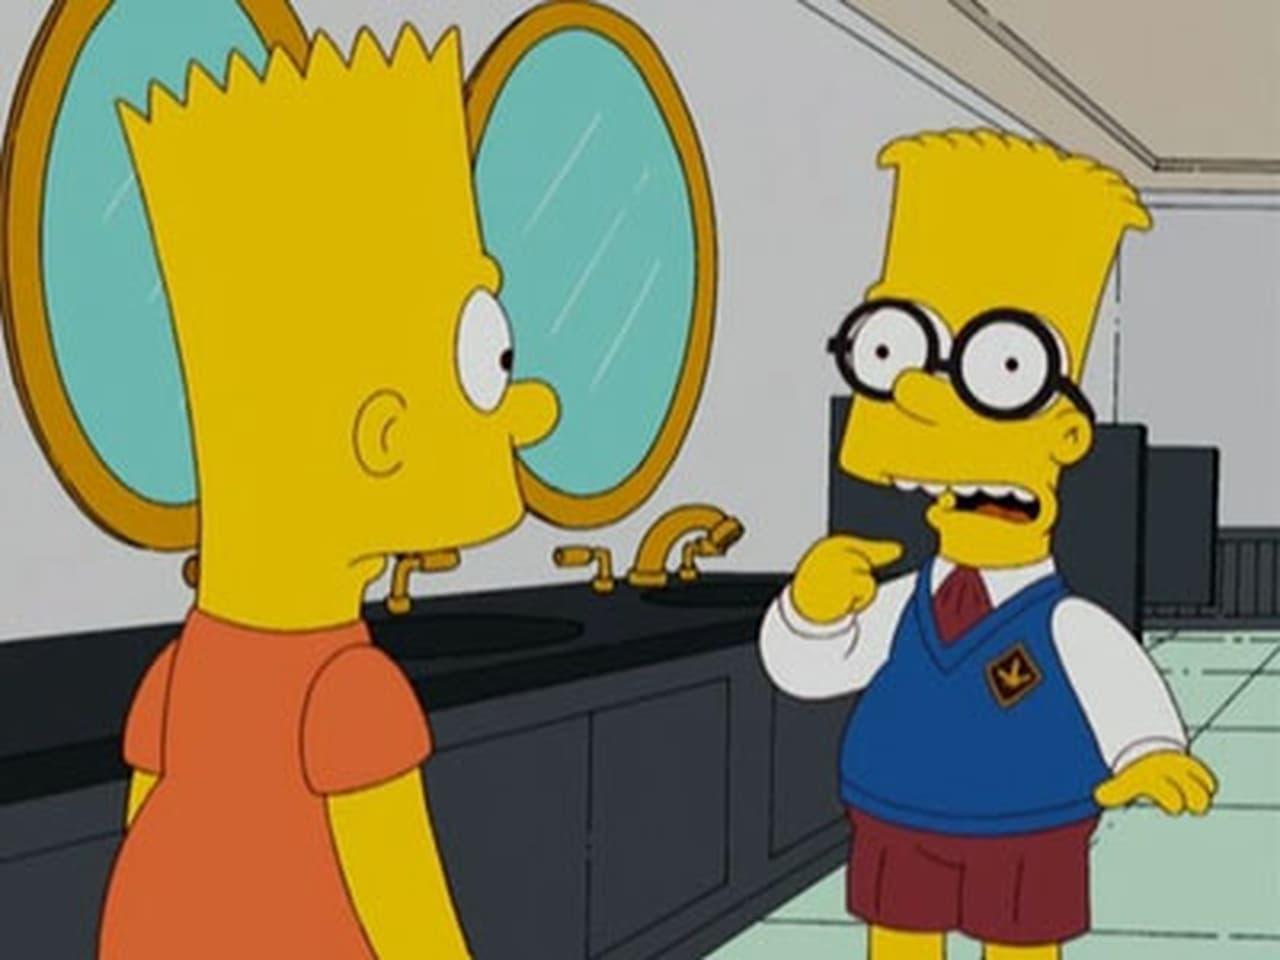 The Simpsons - Season 20 Episode 3 : Double, Double, Boy in Trouble